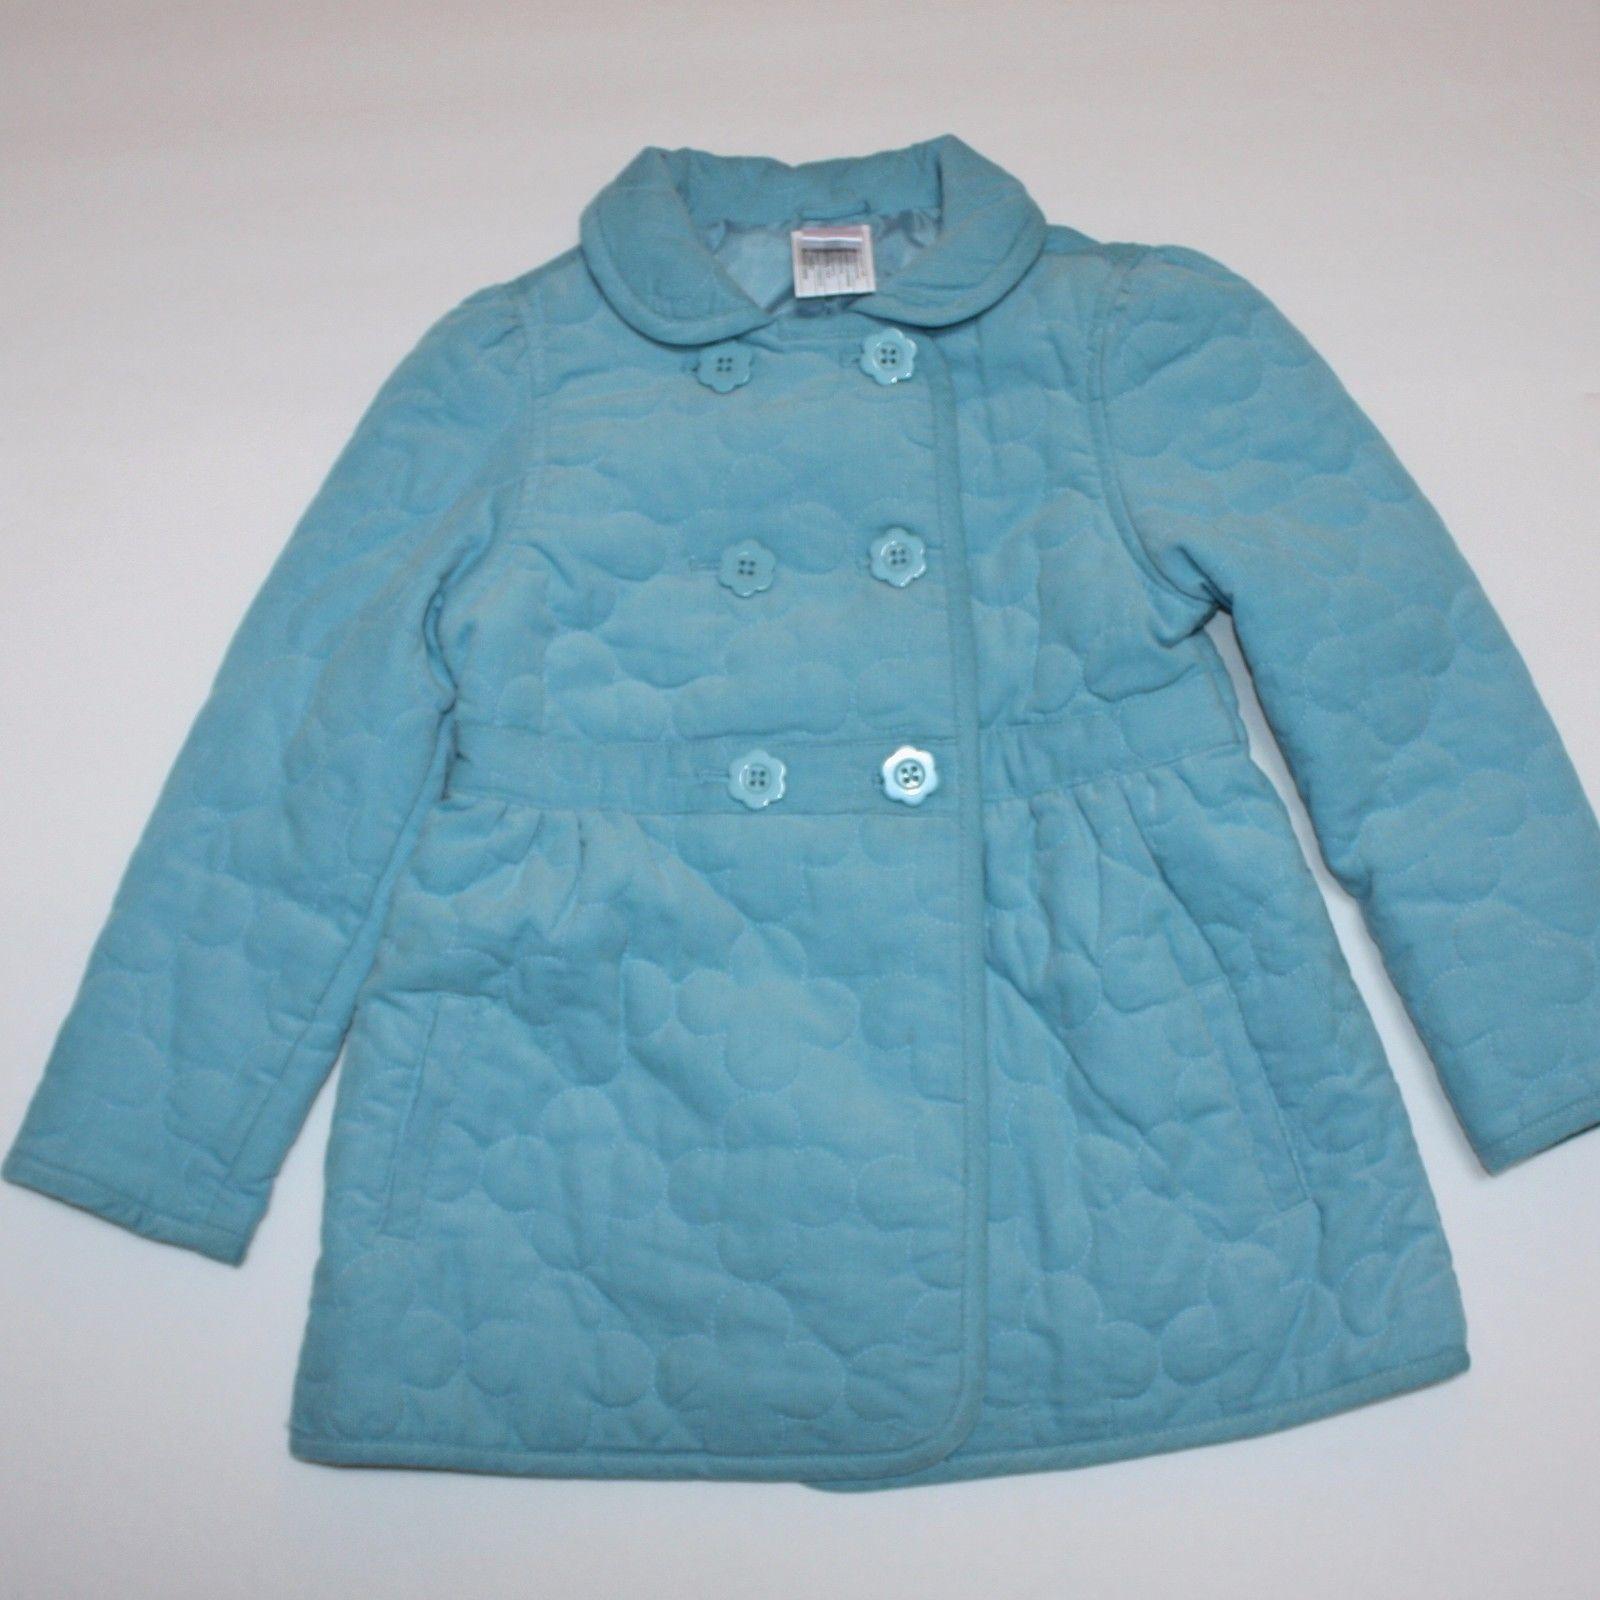 NWT Boy/'s Gymboree blue jean jacket coat ~  6-12 months FREE SHIPPING!